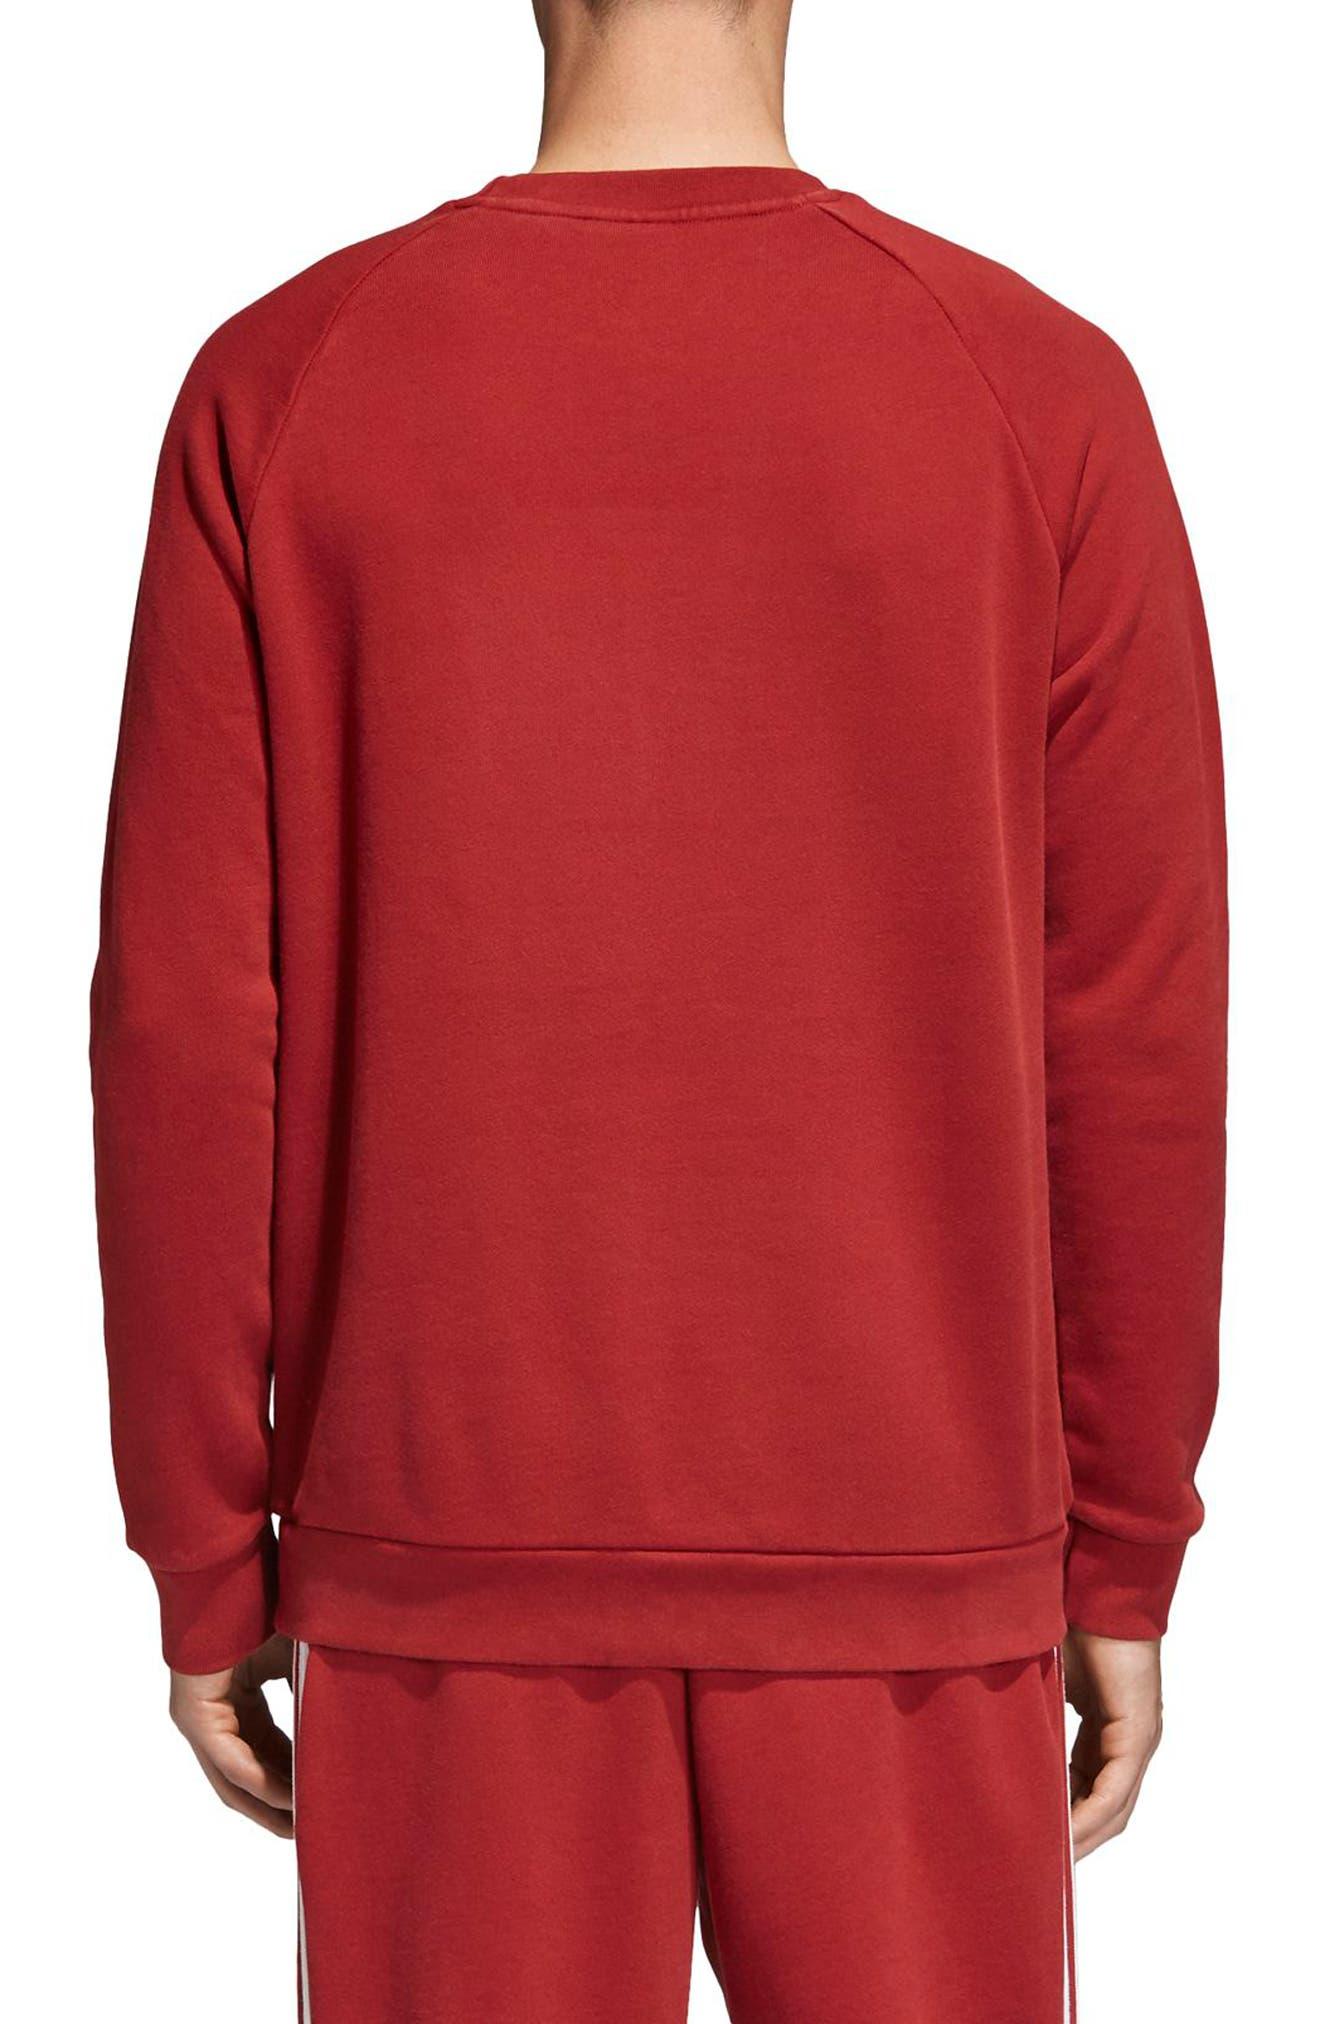 adidas Trefoil Crewneck Sweatshirt,                             Alternate thumbnail 2, color,                             Rusred